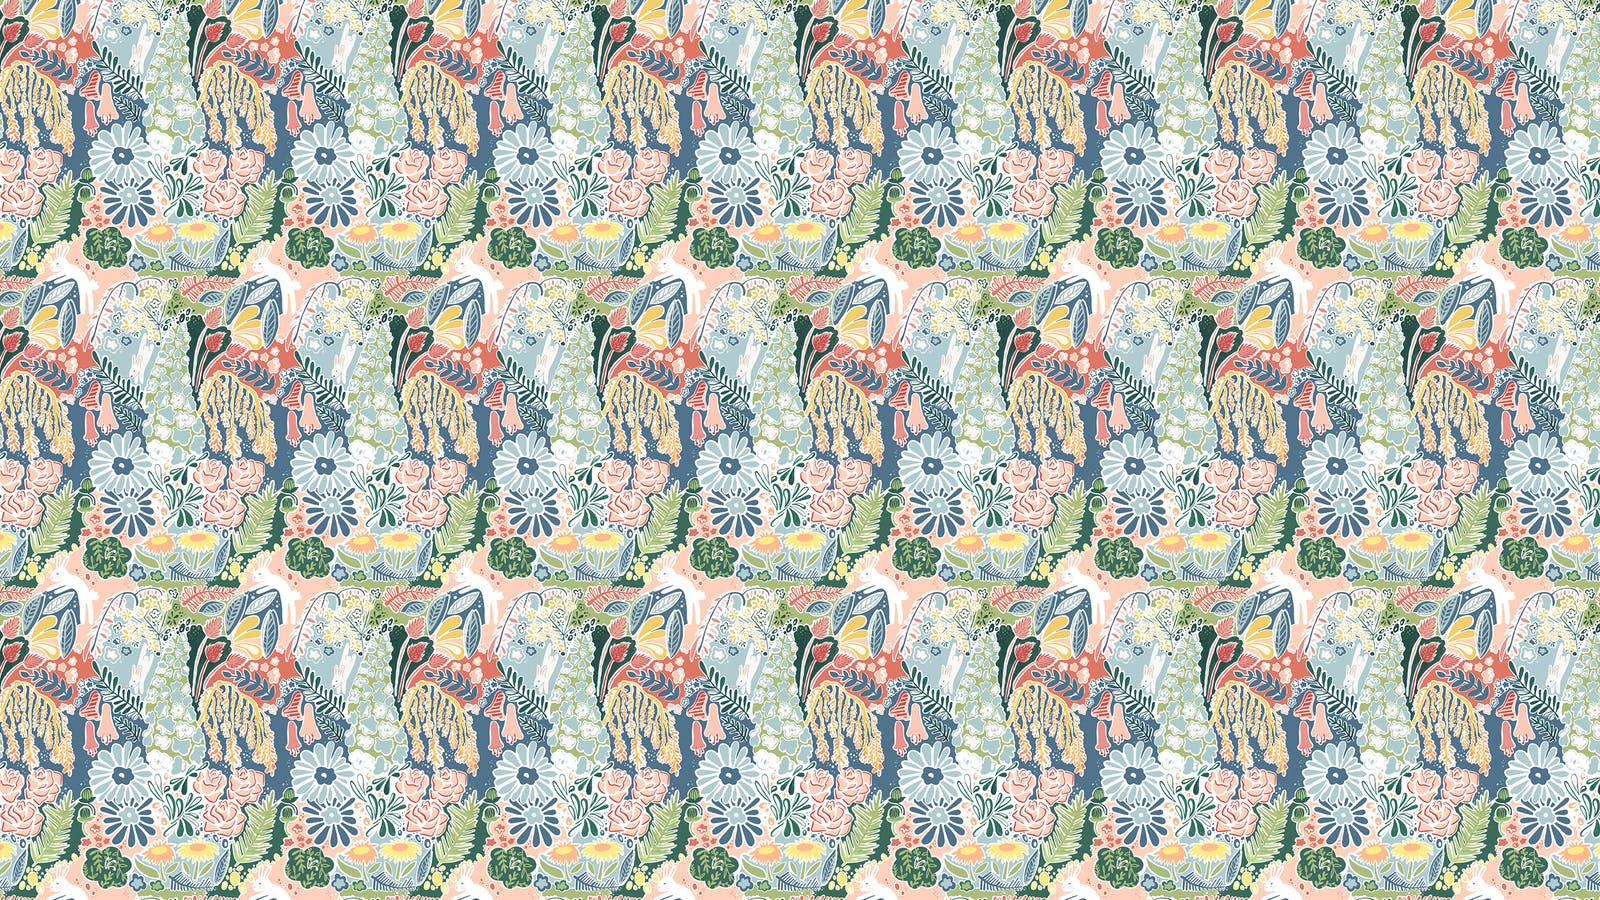 Lick x Franki Barber Enchanted Forest 01 kid's magical rabbit wallpaper